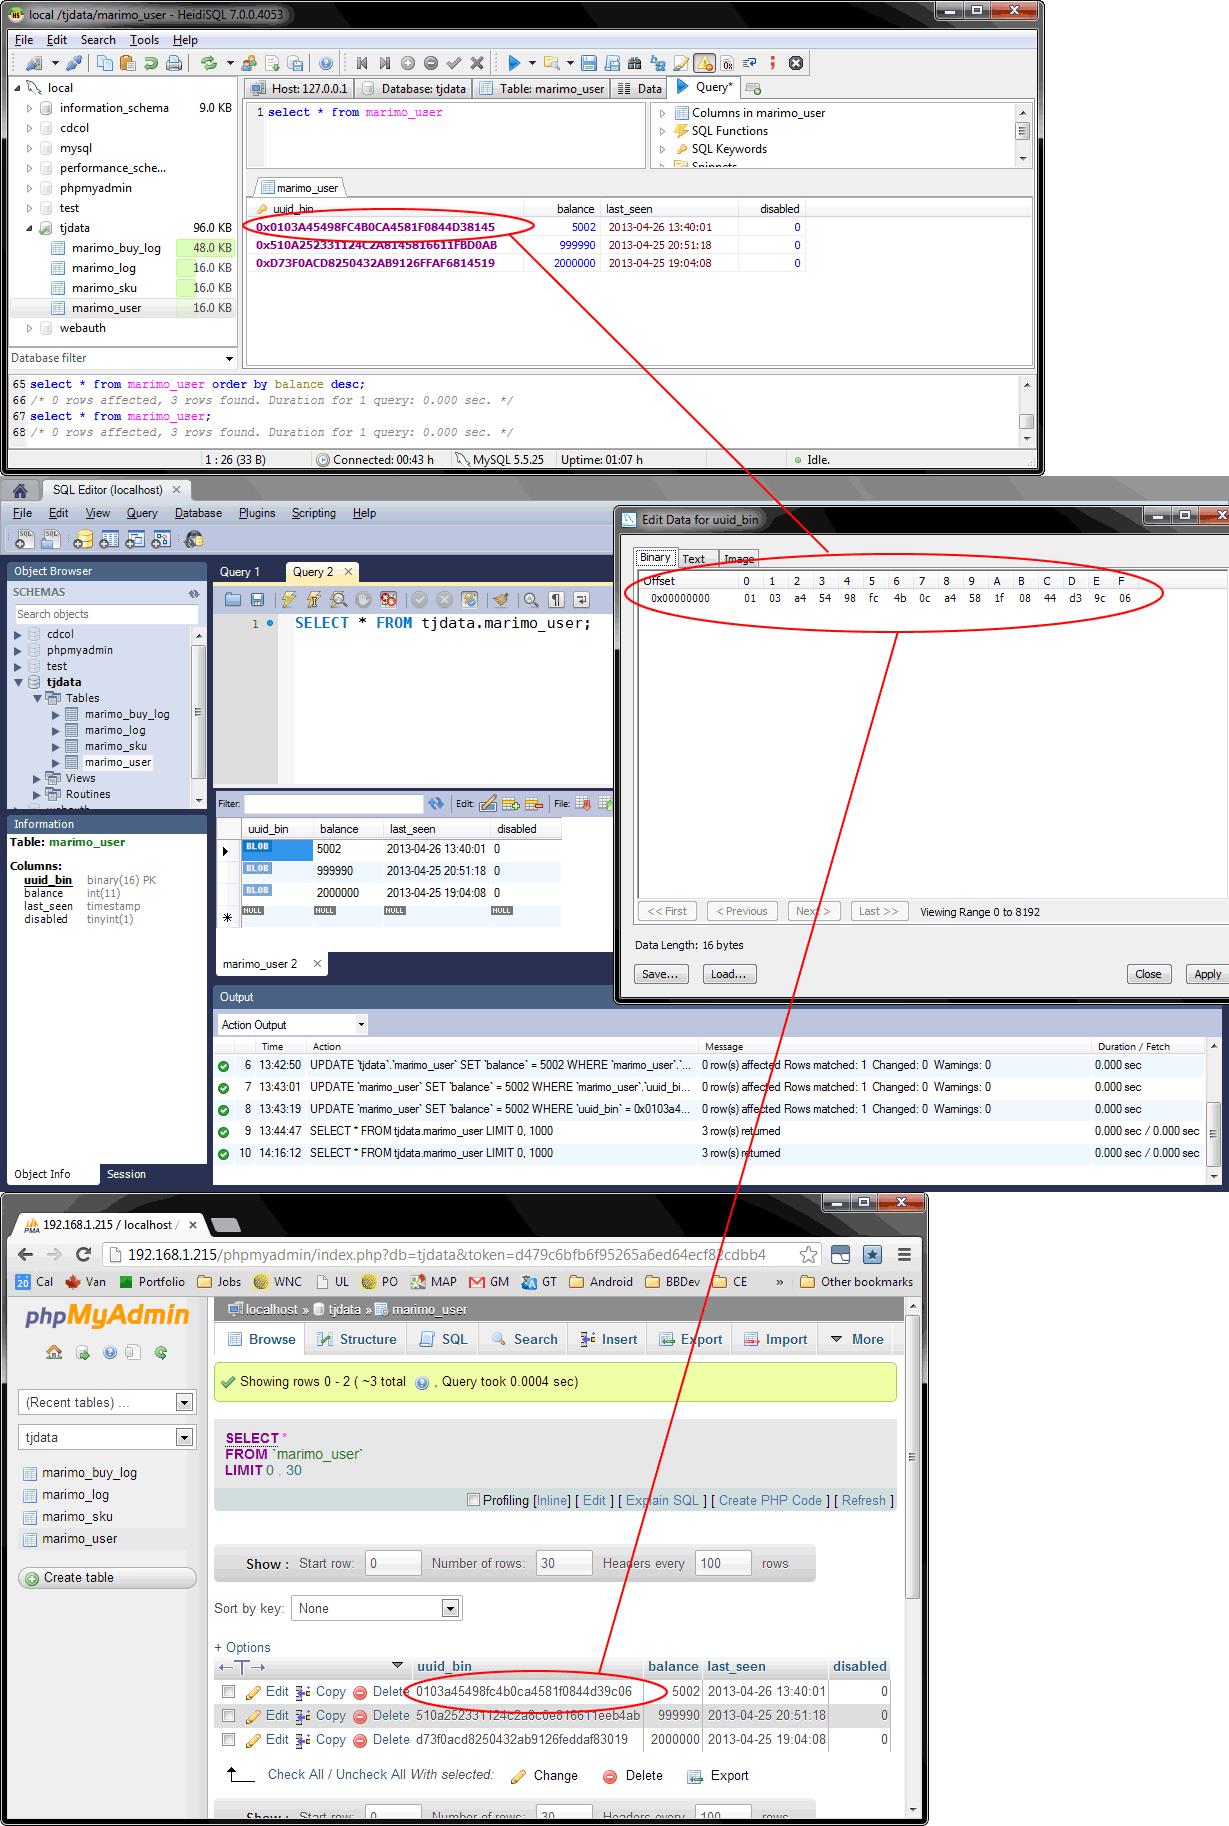 heidisql / Tickets / #3102 VARBINARY datatype output incorrect